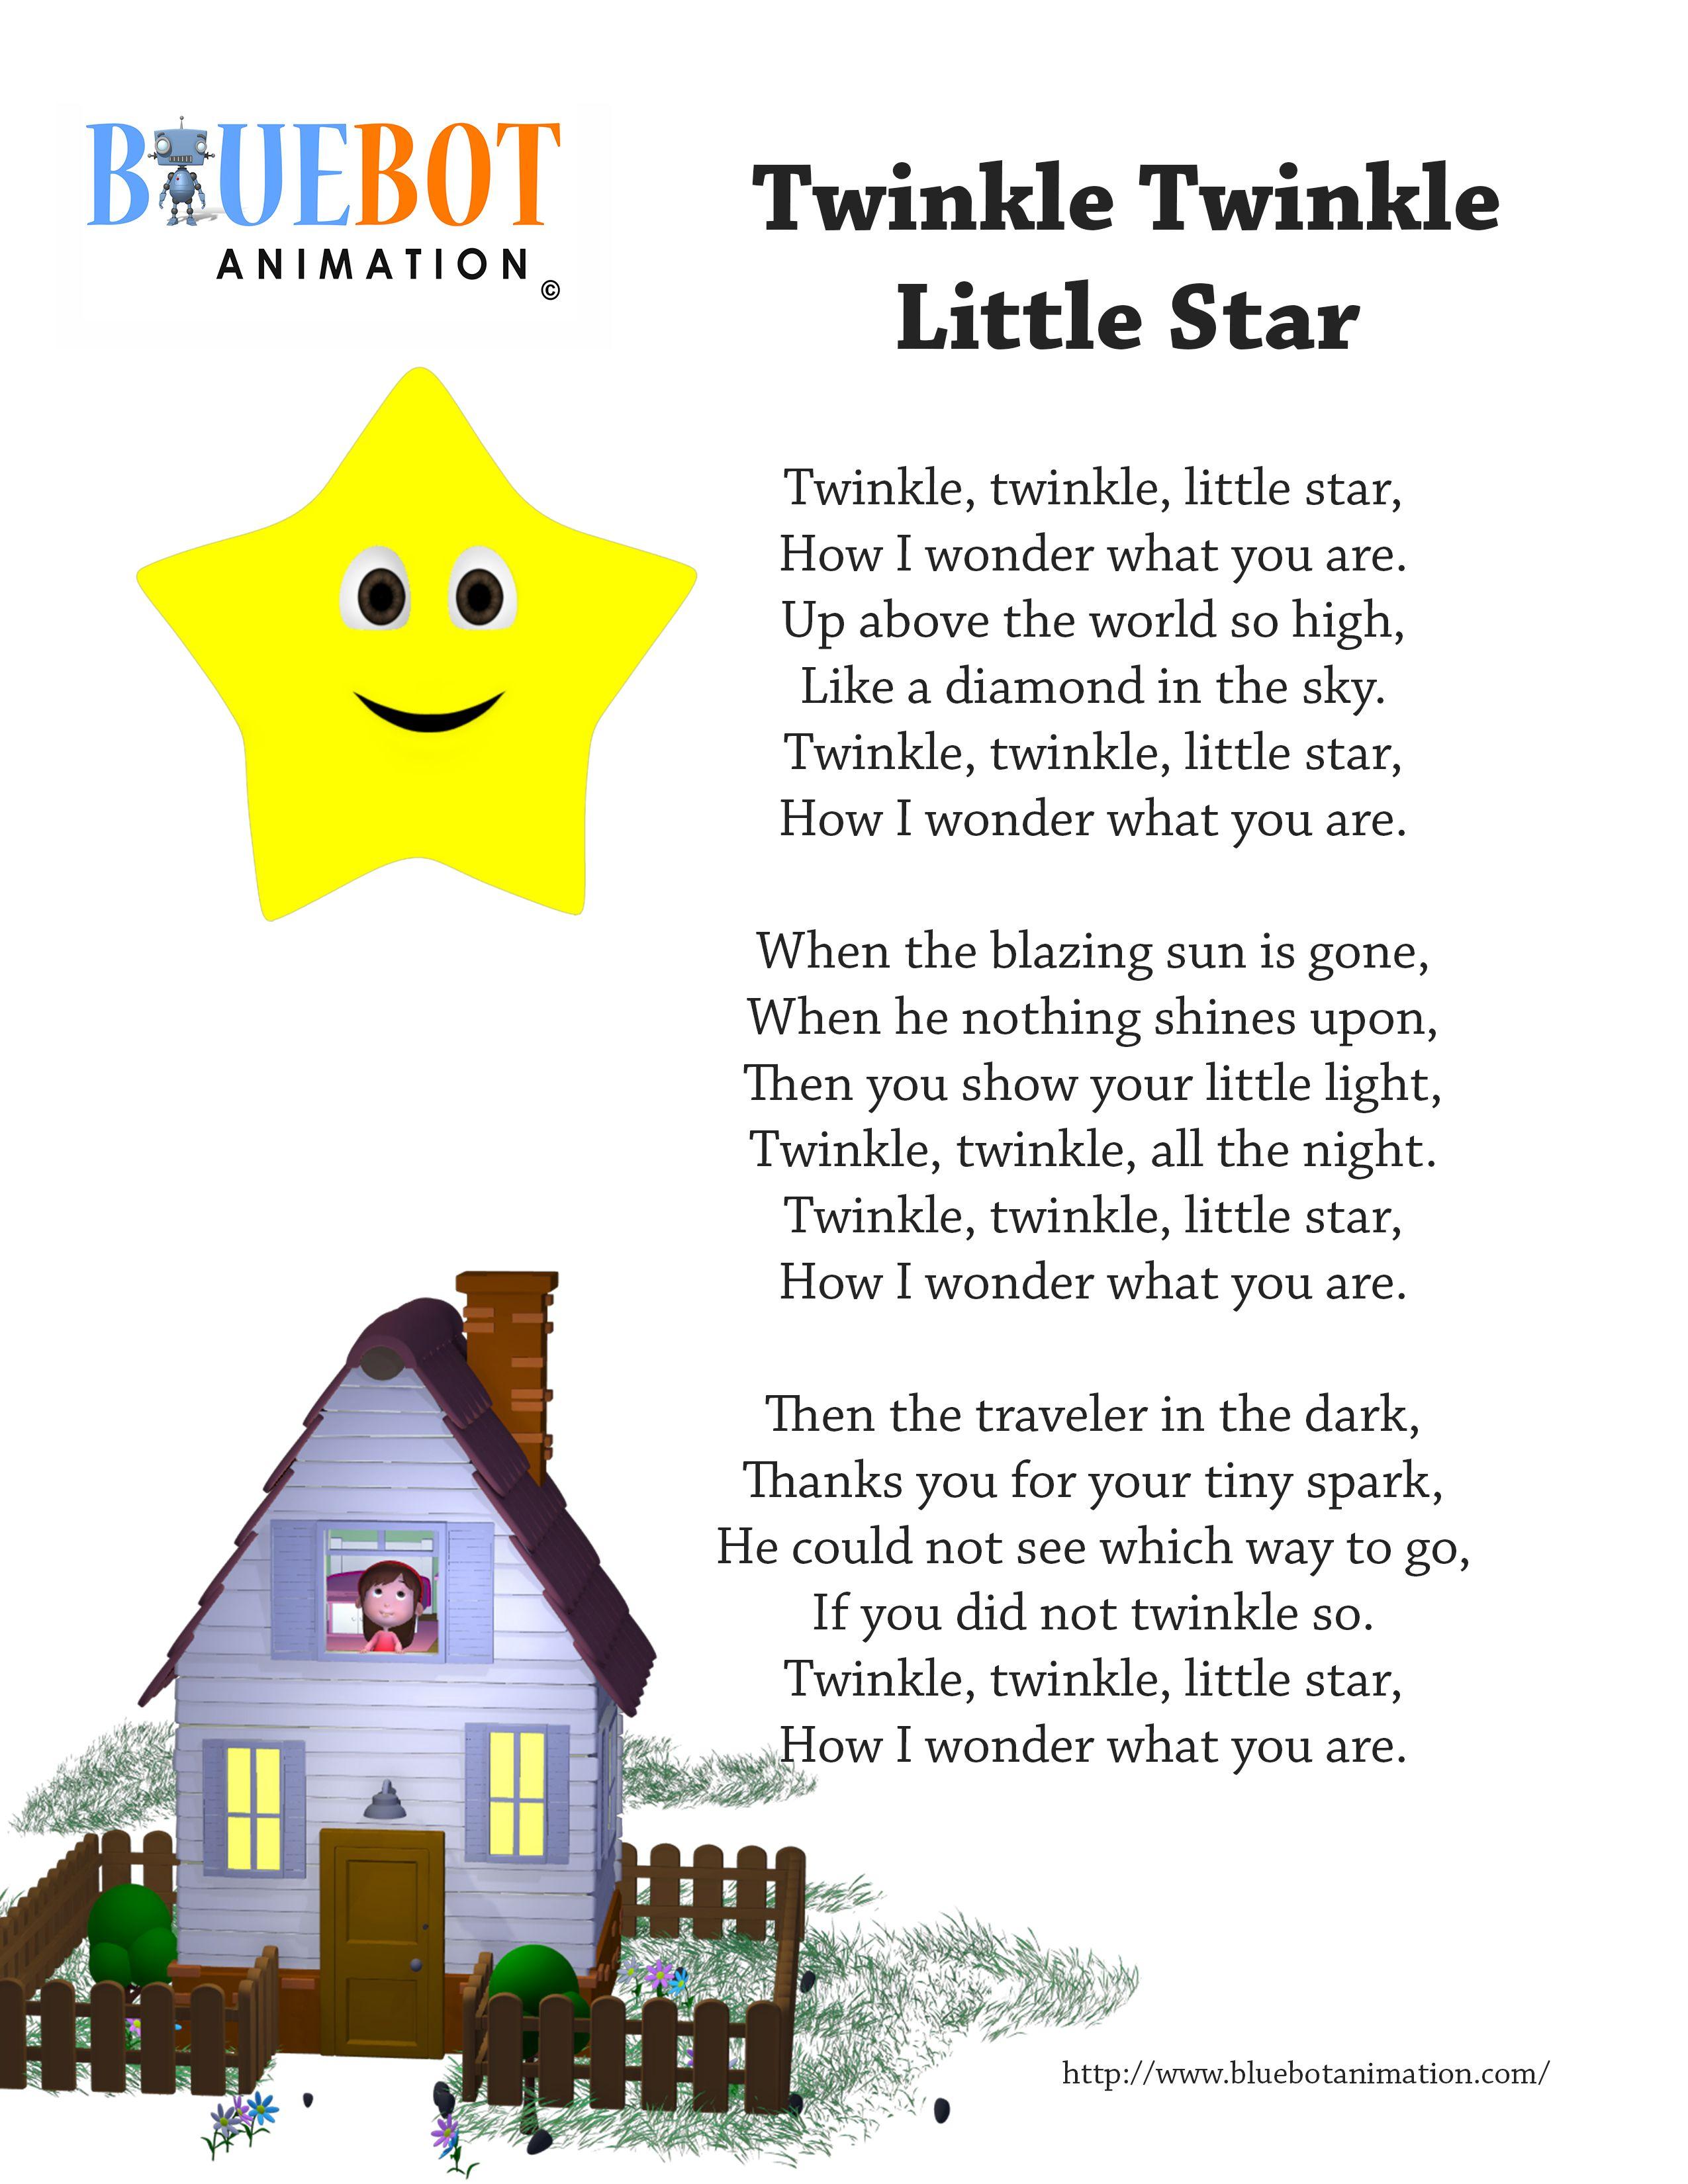 Twinkle Twinkle Little star nursery rhyme lyrics Free